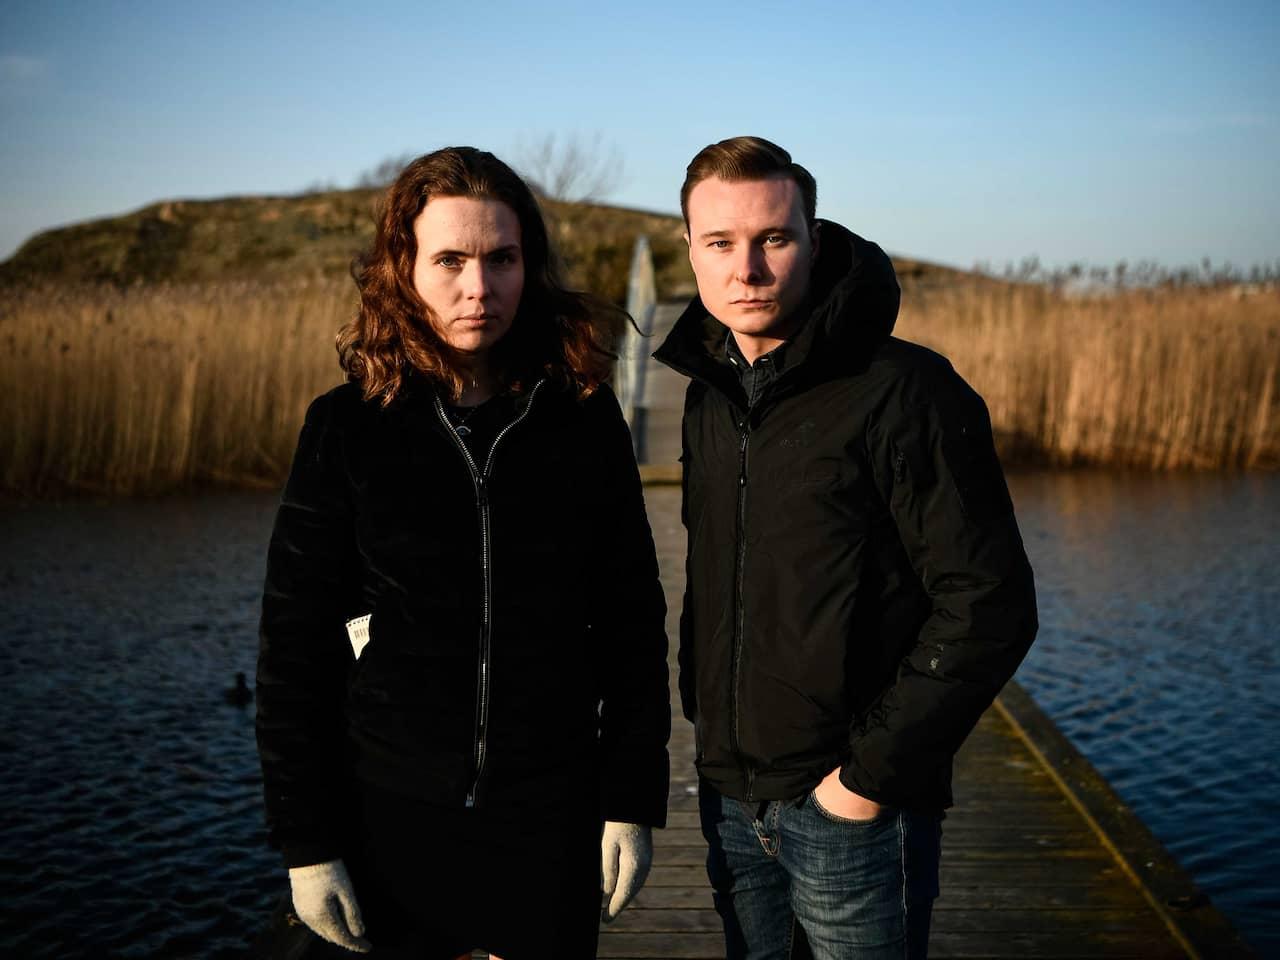 Johanna Karlsson & Alex Ljungdahl